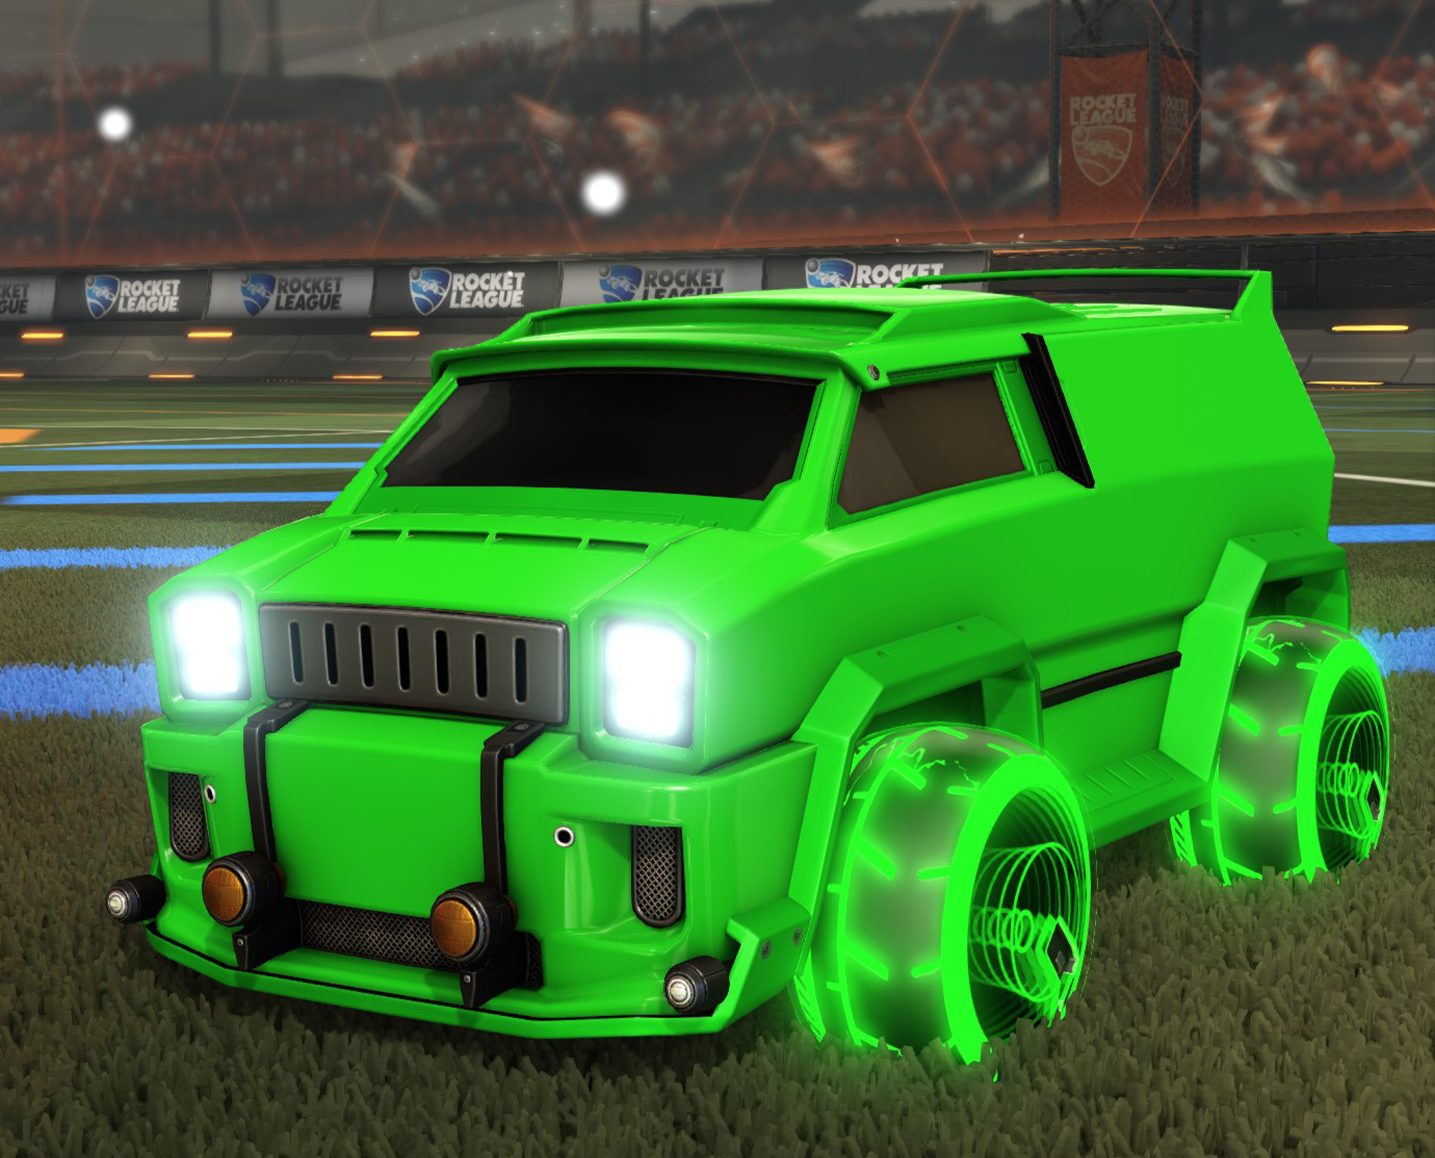 Best Car Rocket League Merc